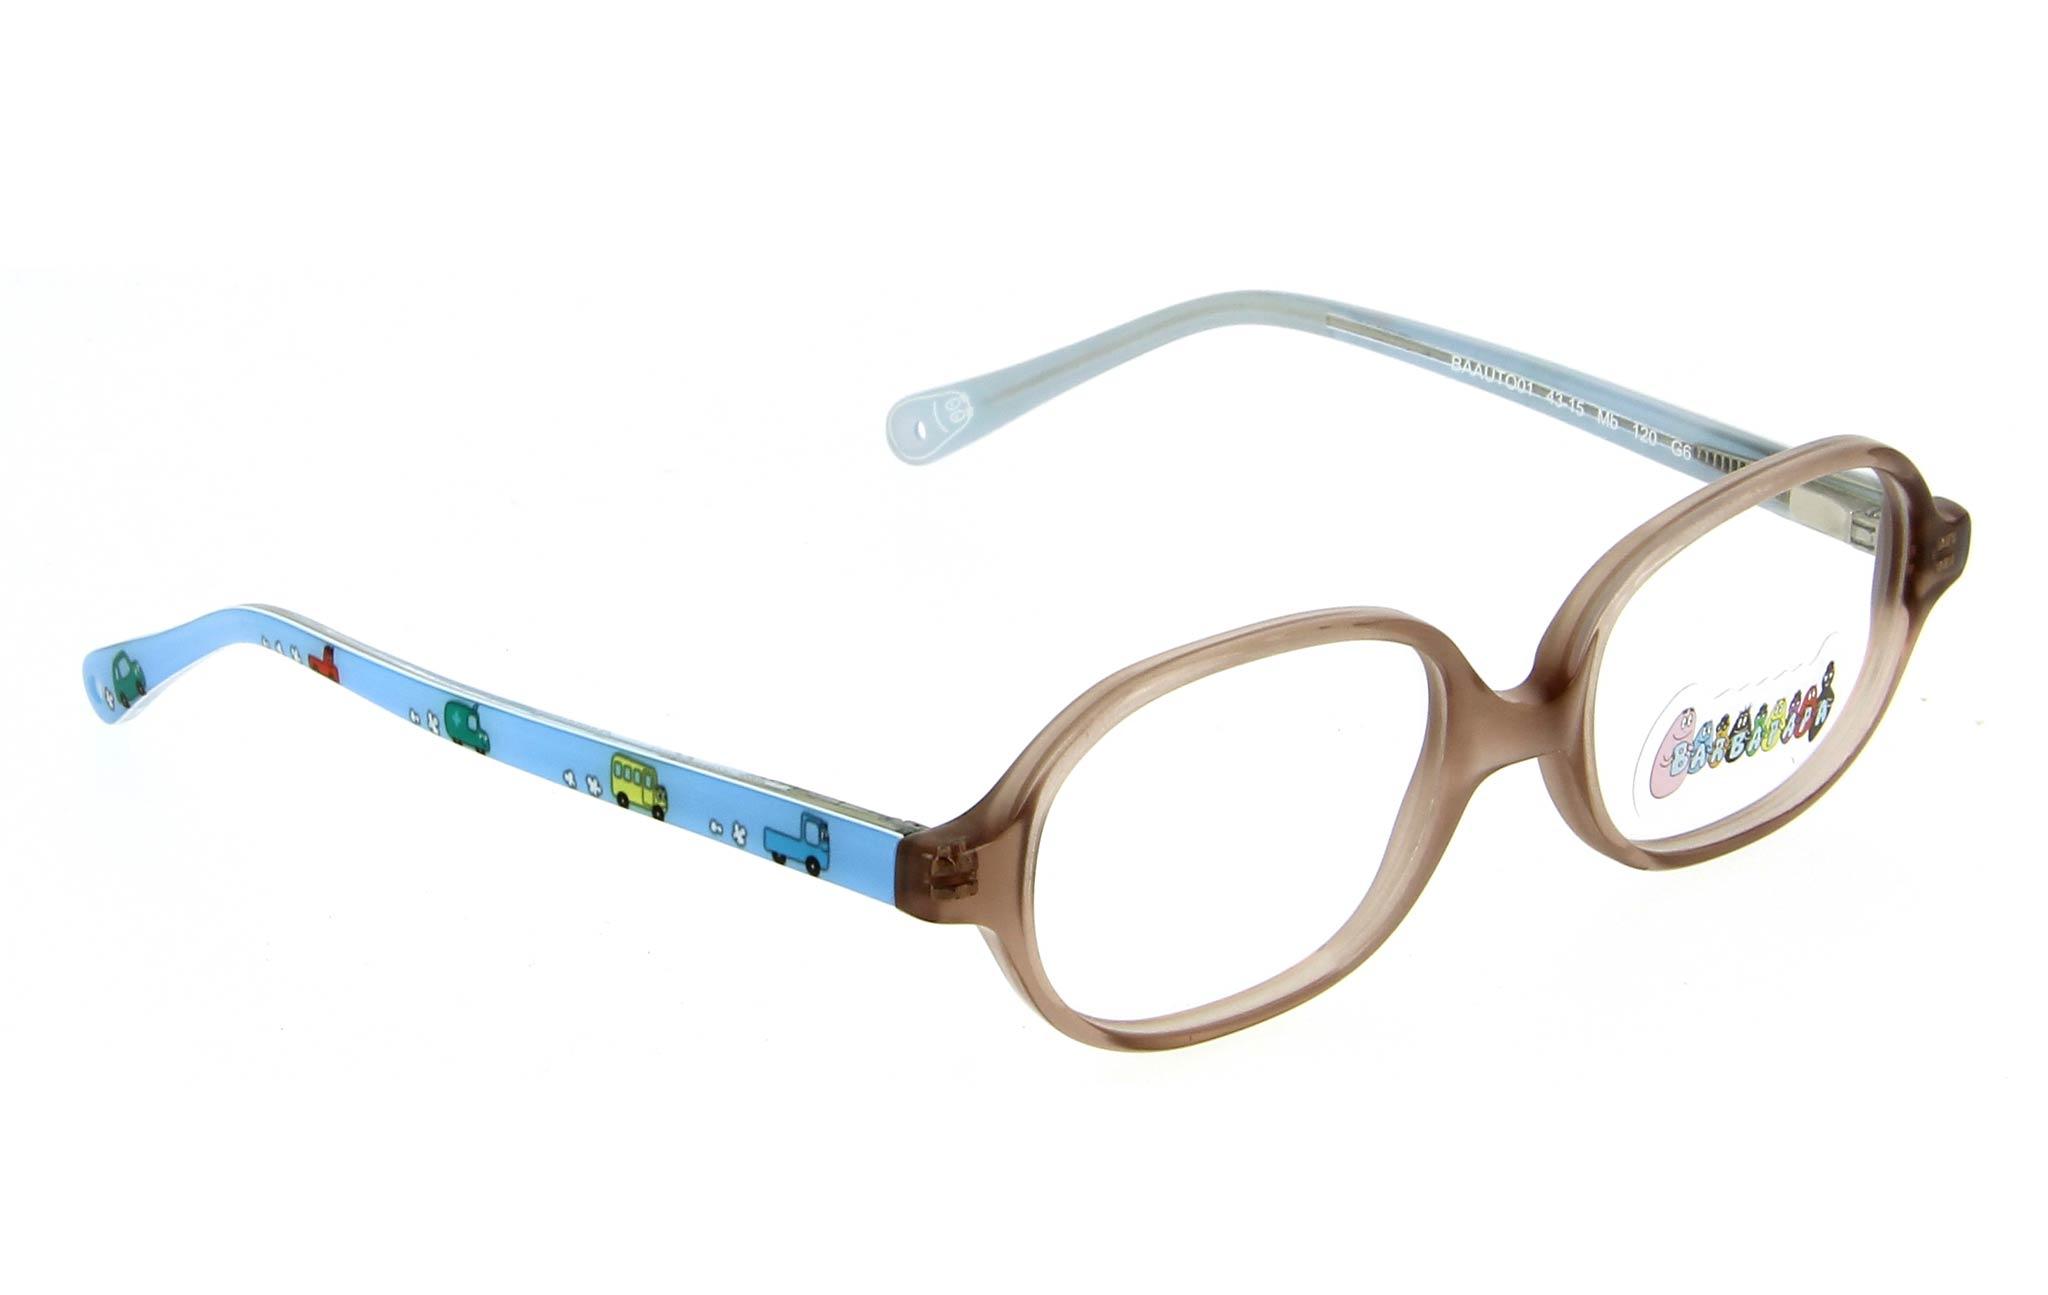 lunettes enfant barbapapa baauto01 mb brun et bleu